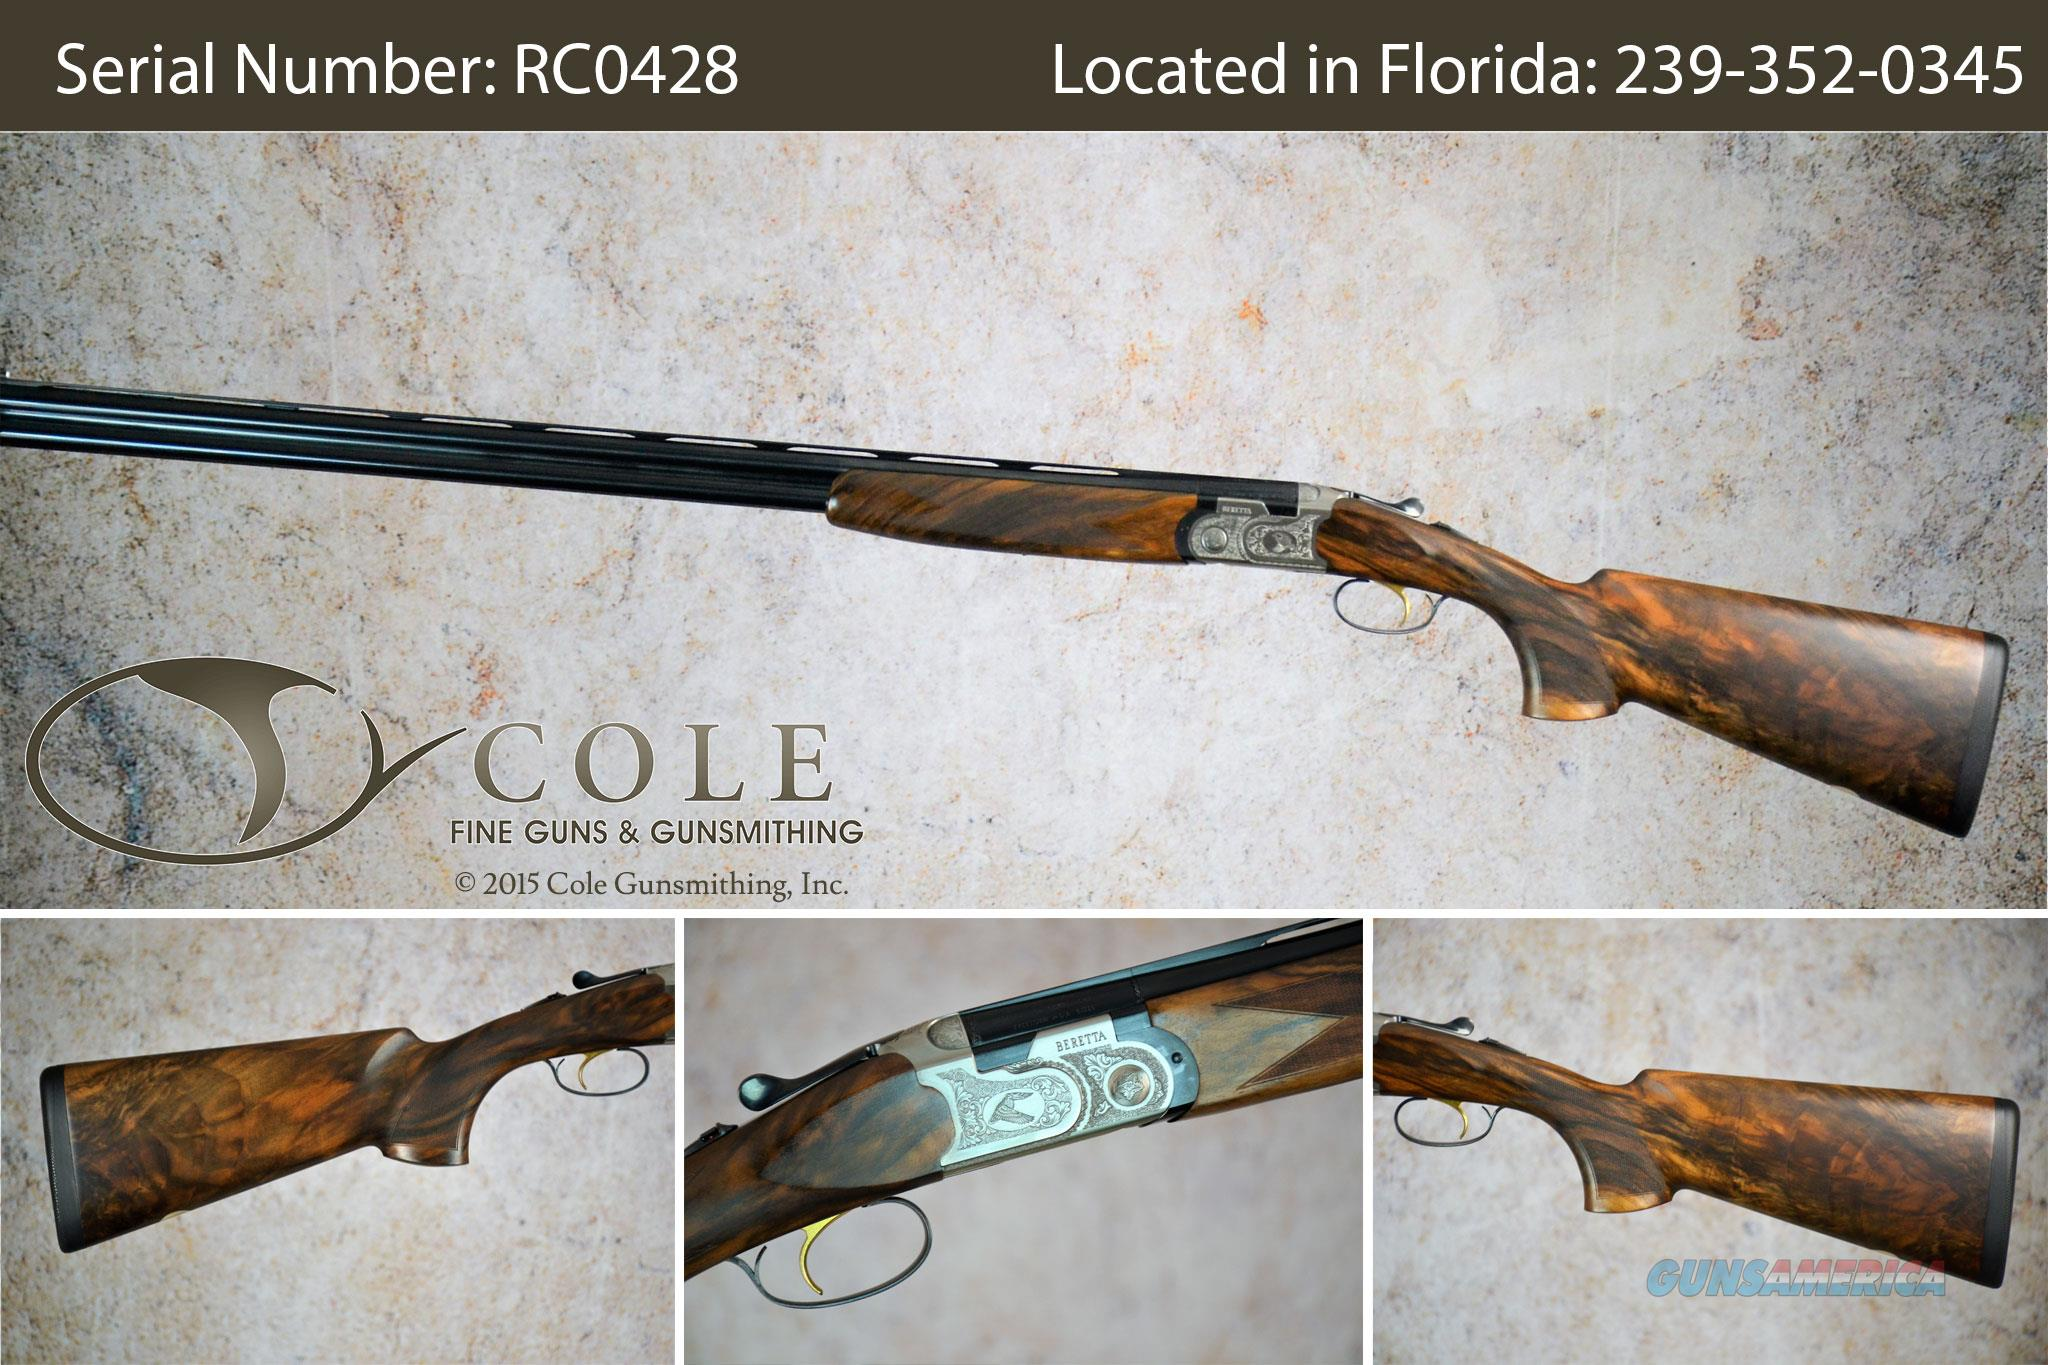 "Beretta Cole Special Silver Pigeon 20/28g 32"" Combo SN:#RC0428  Guns > Shotguns > Beretta Shotguns > O/U > Trap/Skeet"